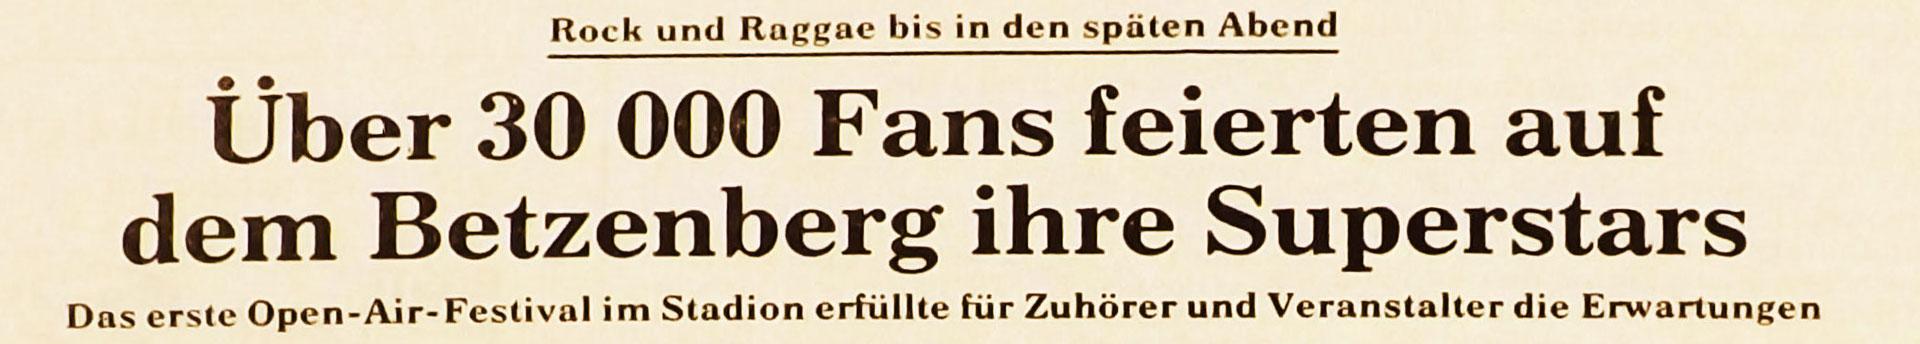 Rheinpfalz vom 09.06.1980 (Foto: Archiv Eric Lindon)